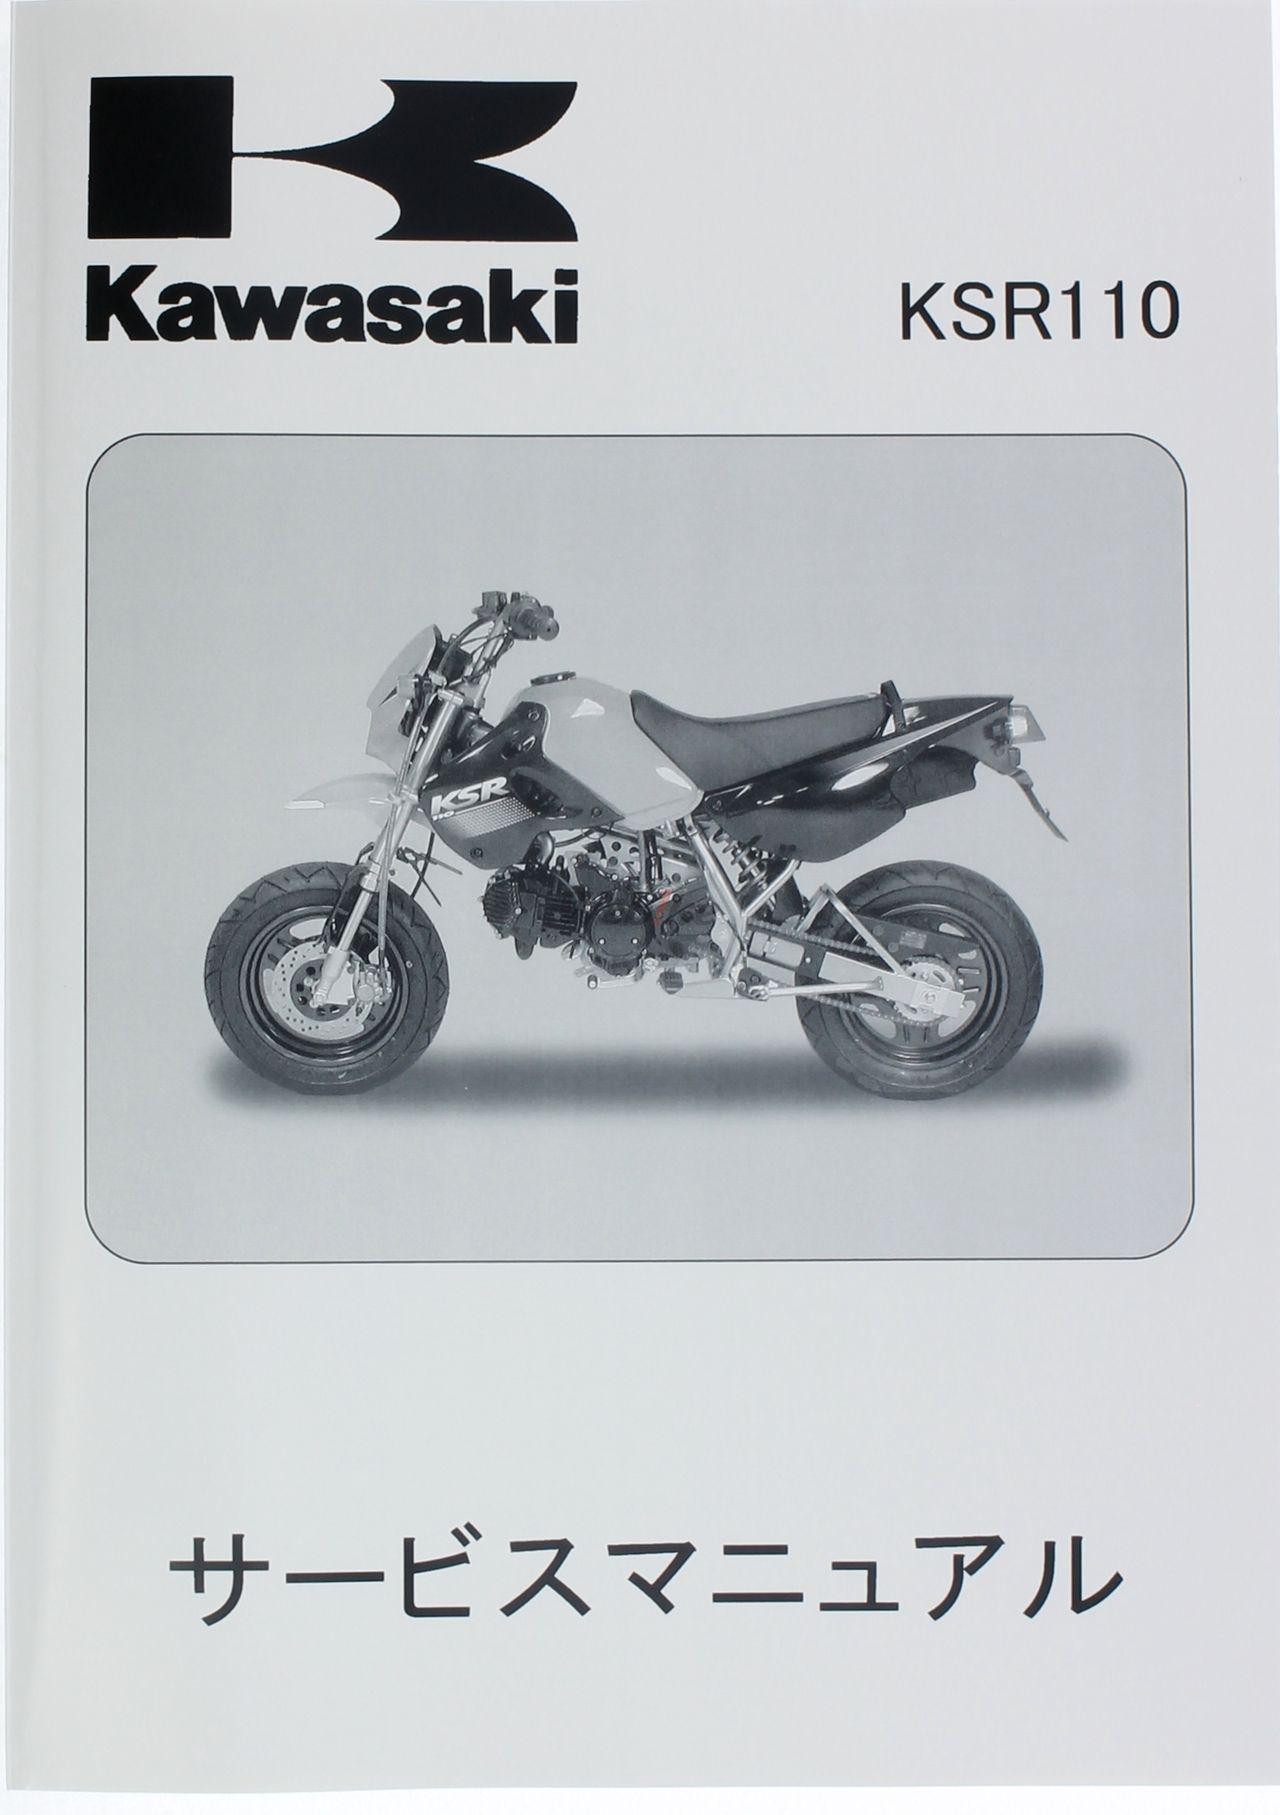 【KAWASAKI】KSR110 維修手冊(基本版) - 「Webike-摩托百貨」